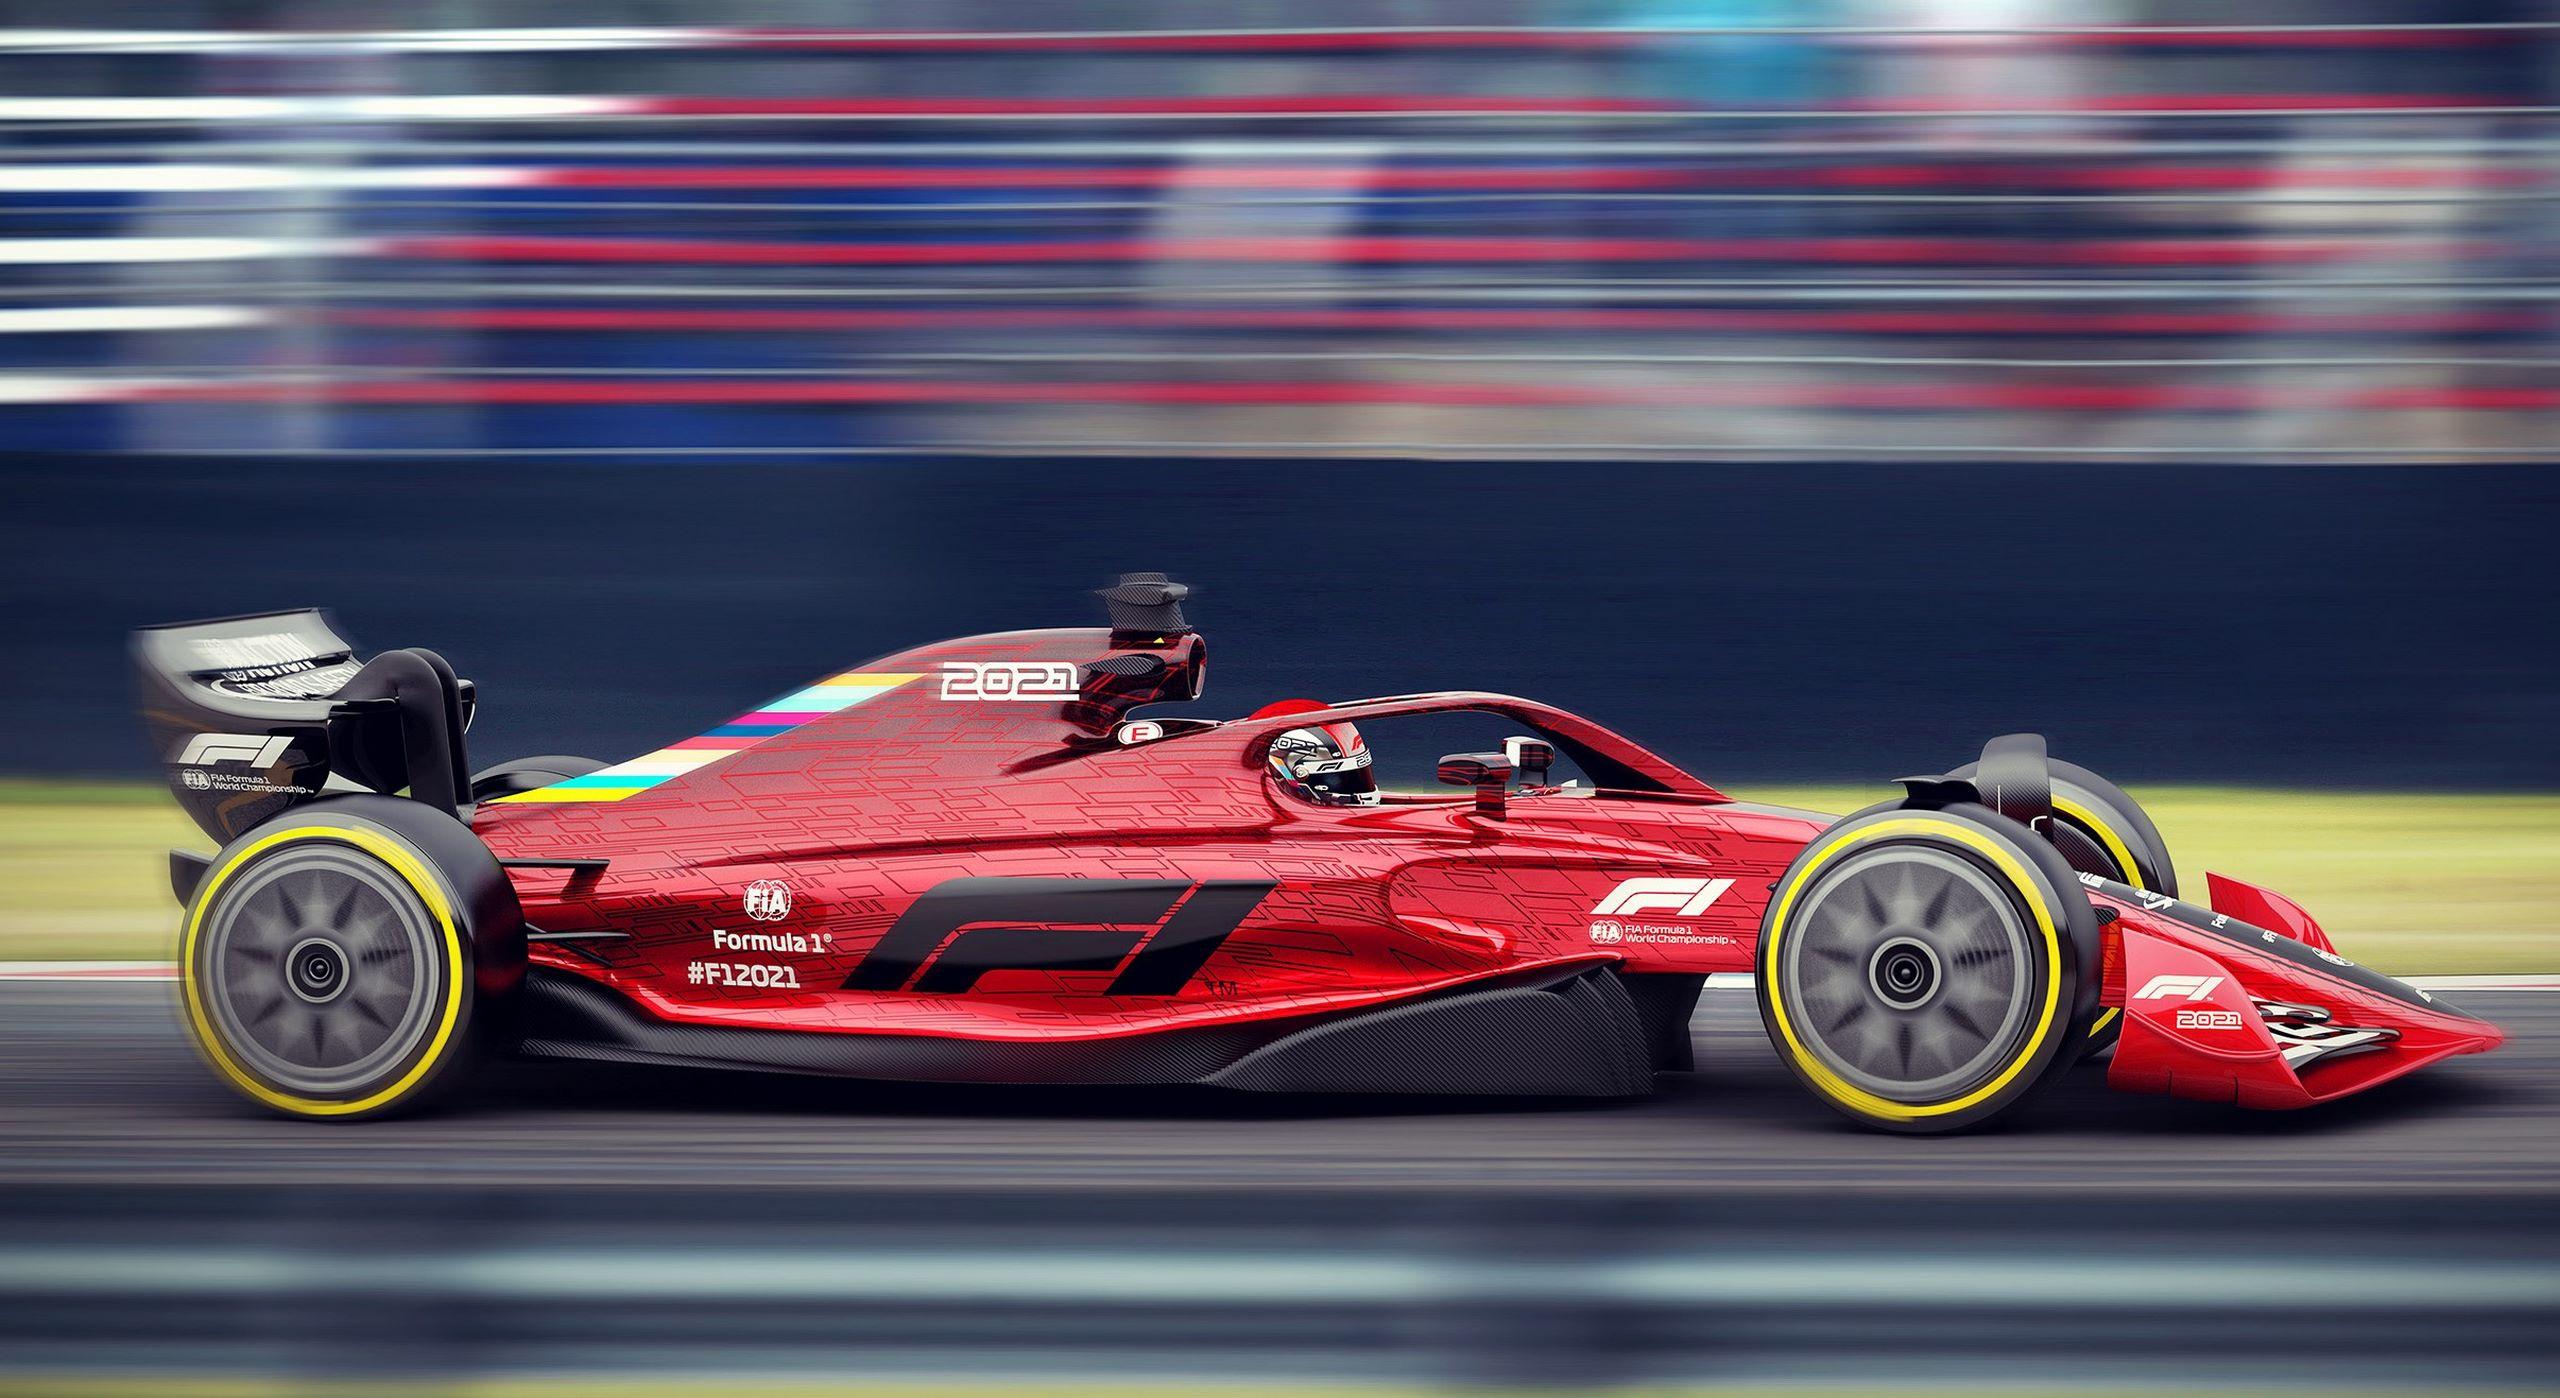 2021-formula-1-race-car-rendering f1 (5)